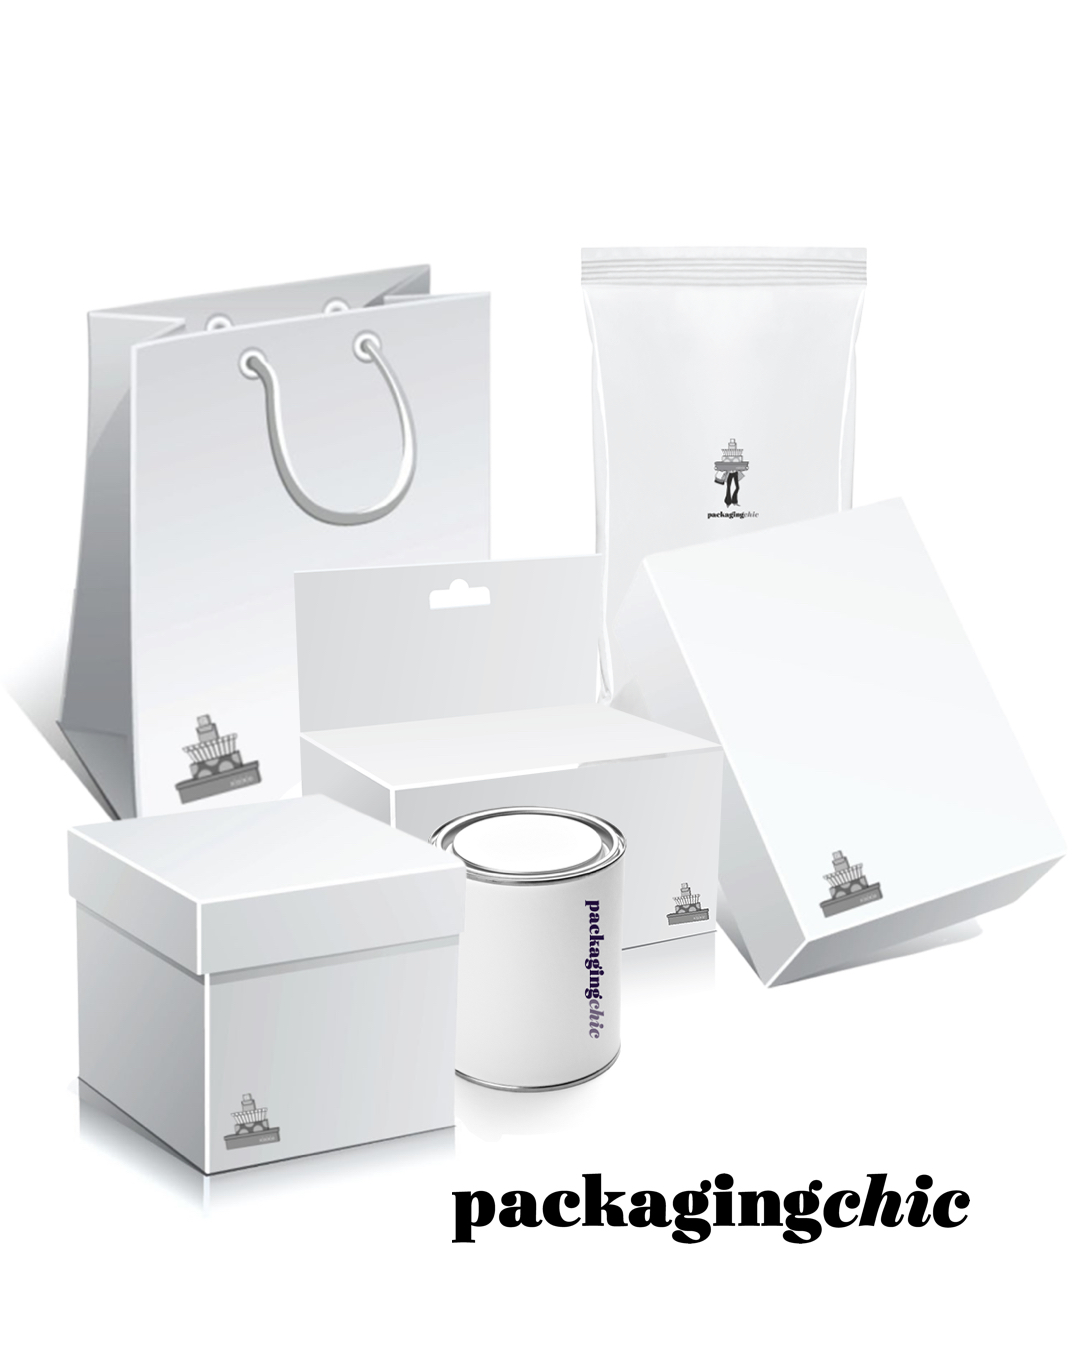 Packaging_Chic_West Headshots.001.jpeg